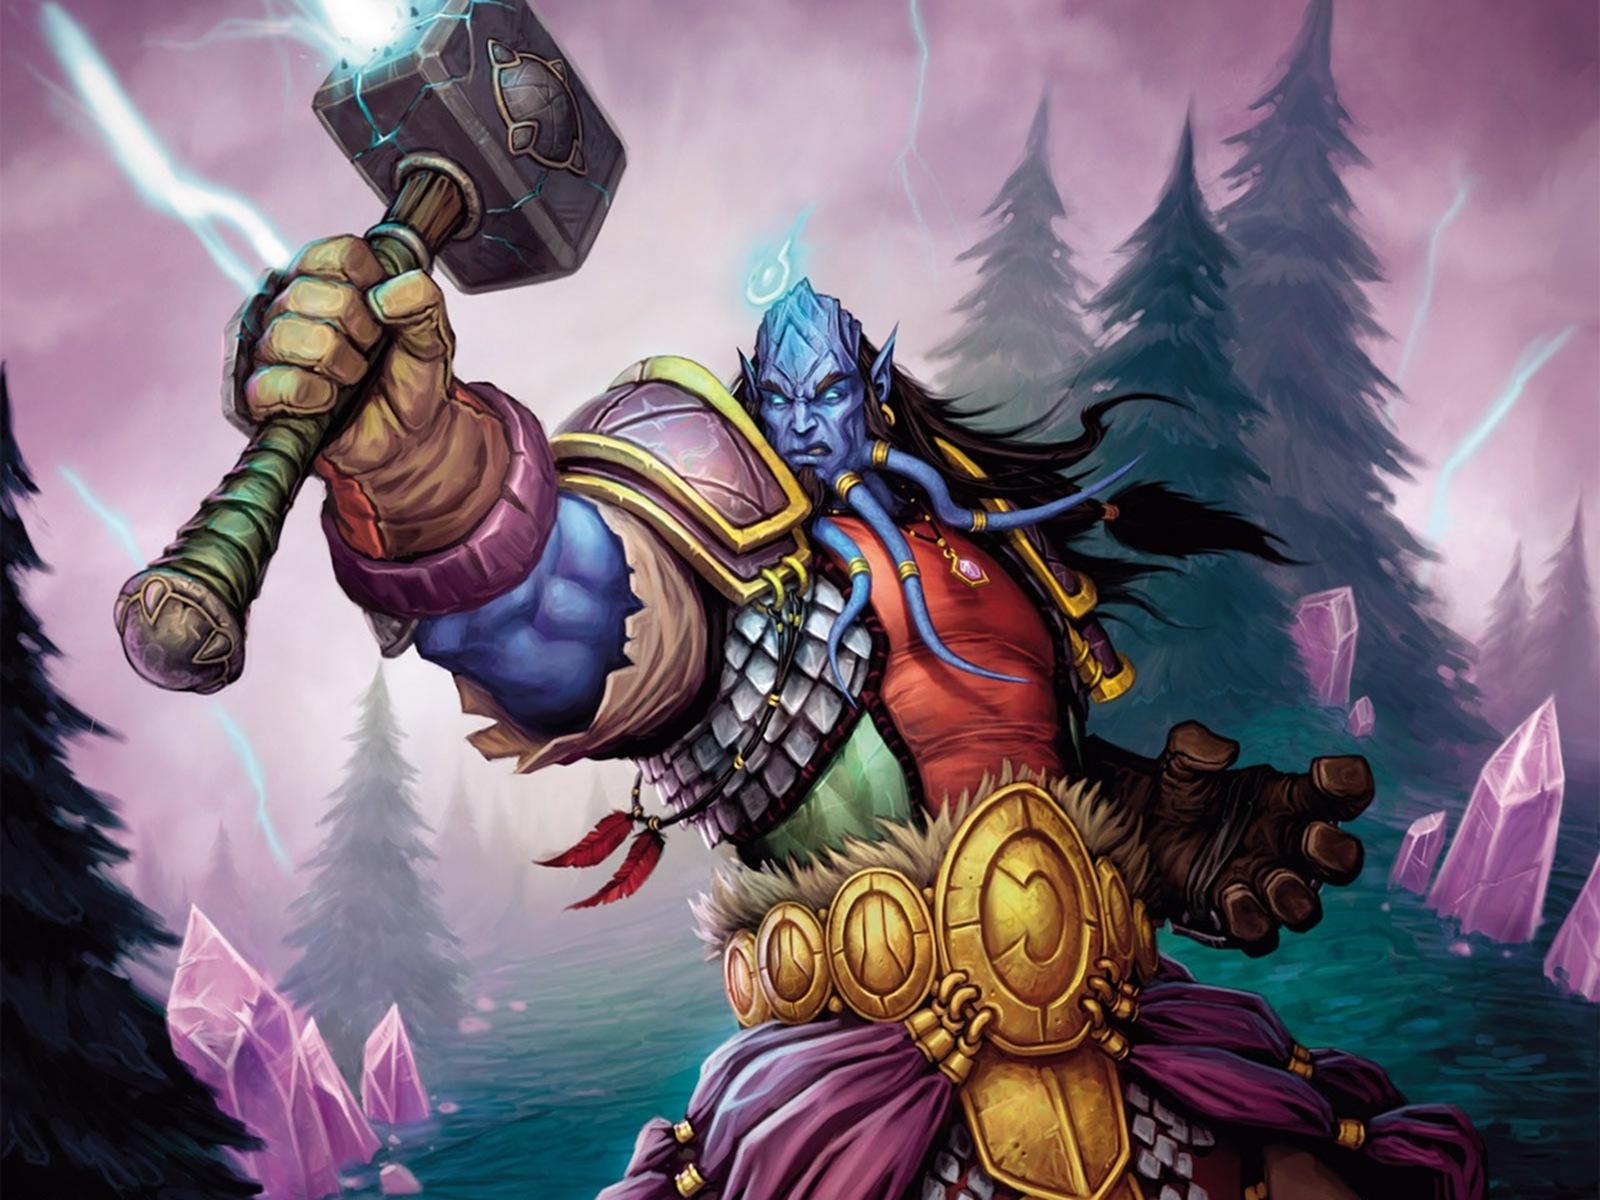 World of Warcraft Wallpapers   Taringa 1600x1200